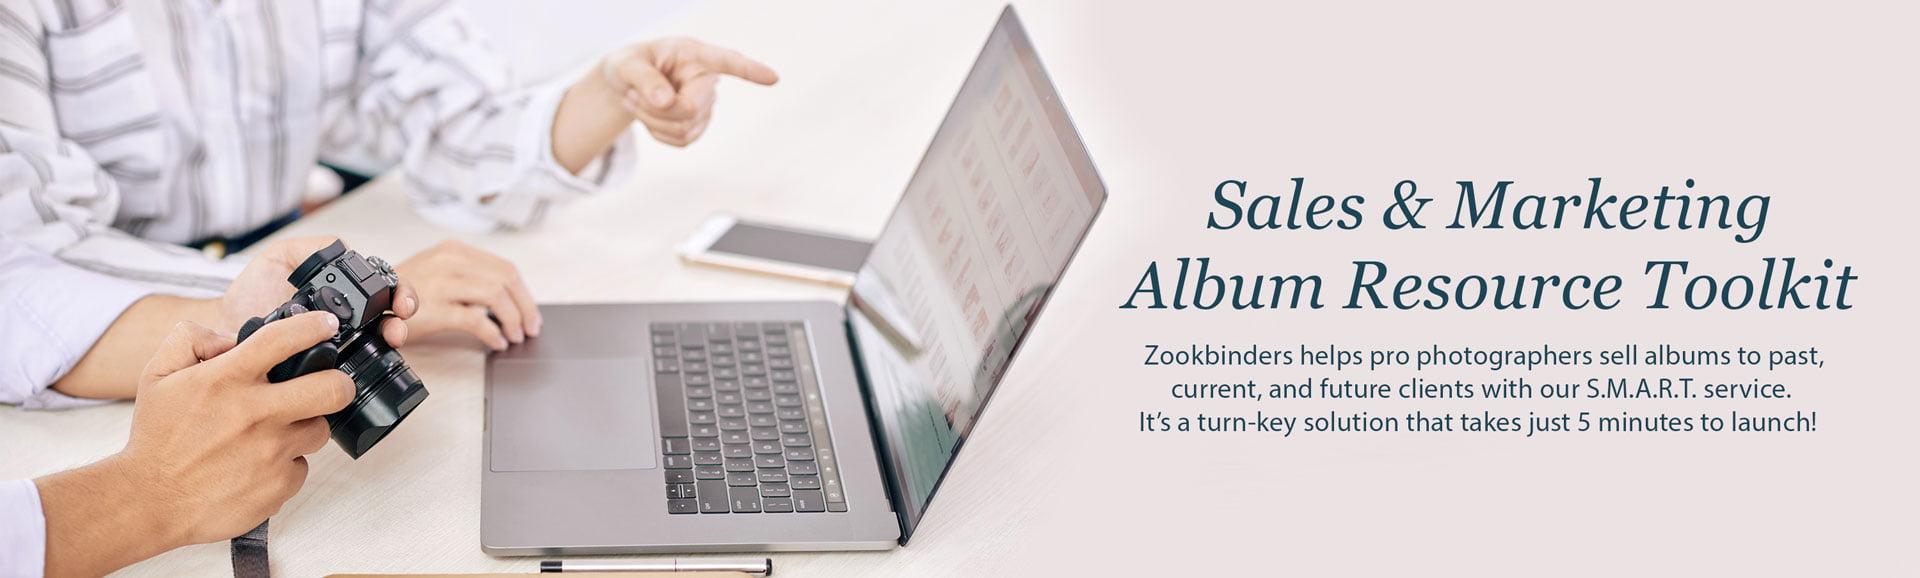 Marketing Album Resource Toolkit